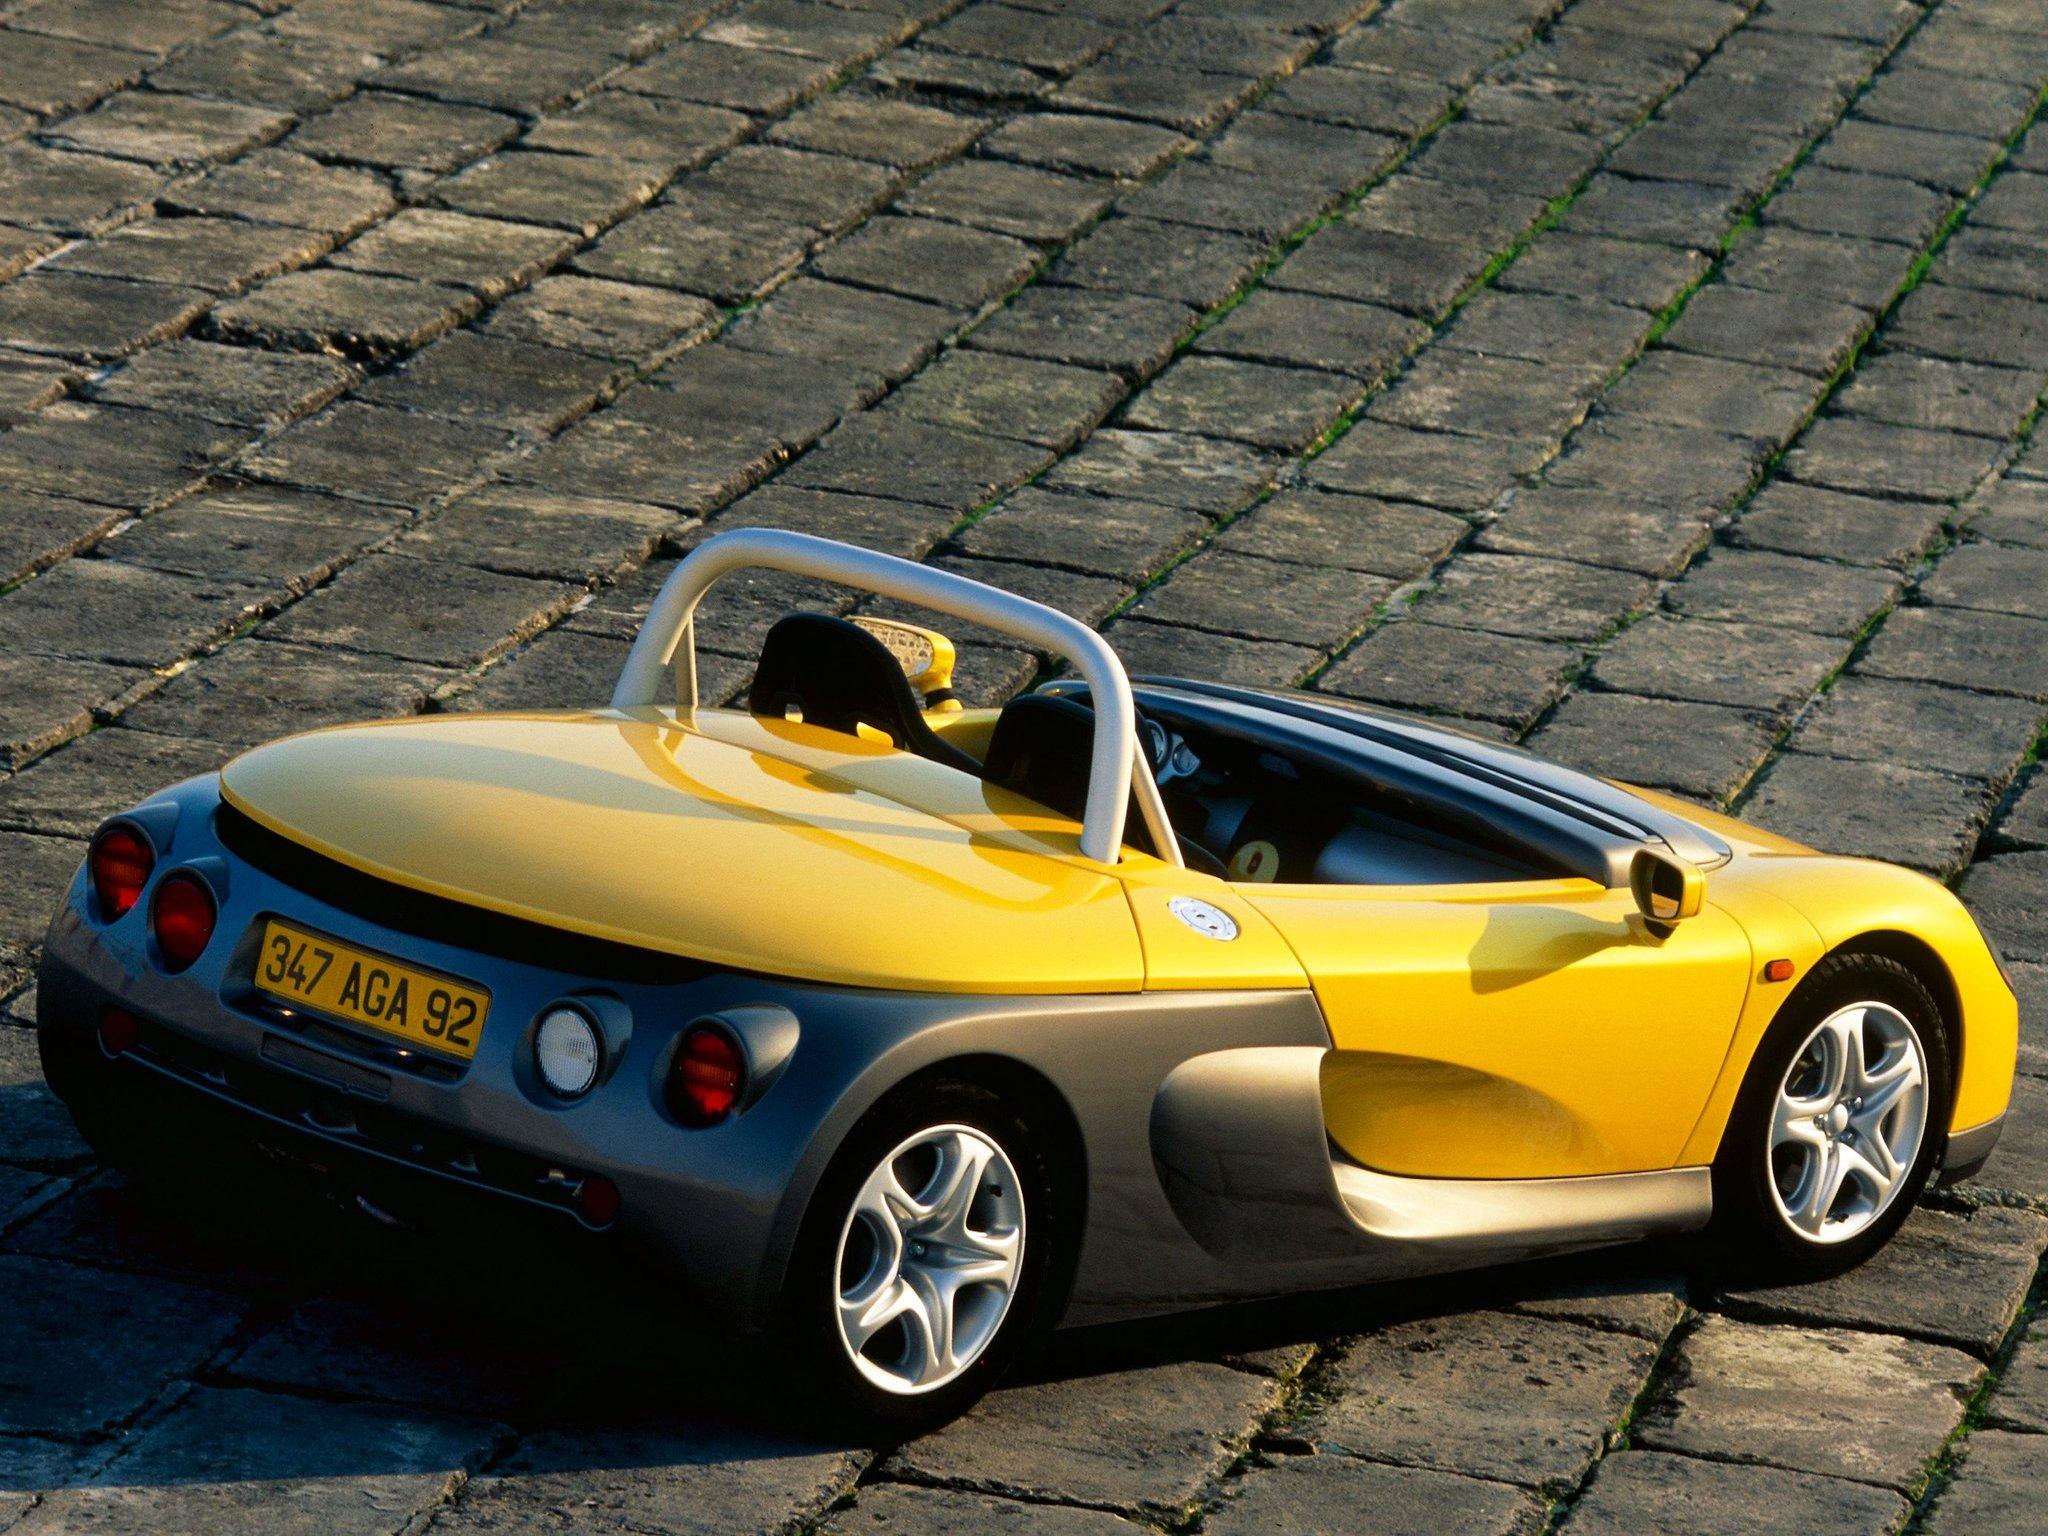 1995 Renault Sport Spider gw wallpaper | 2048x1536 | 423495 | WallpaperUP